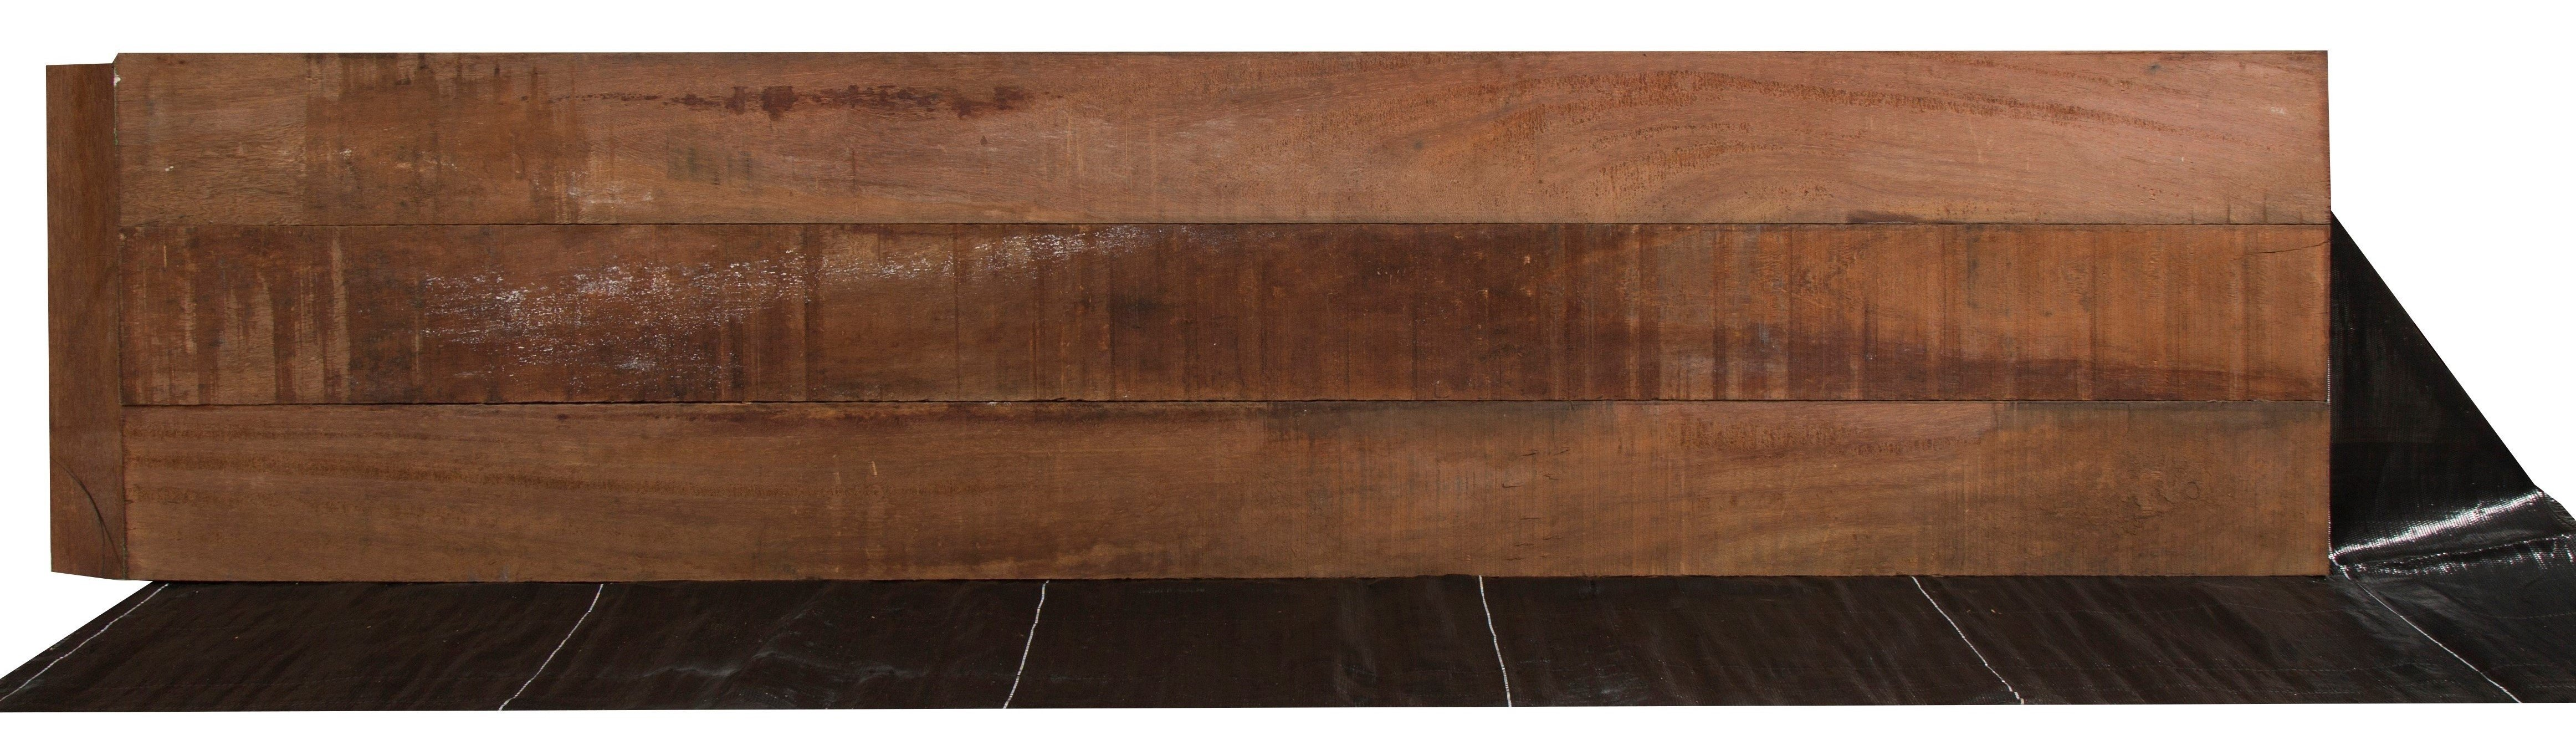 Houten Beschoeingsschotten 80 x 300 cm. Type: Azobe